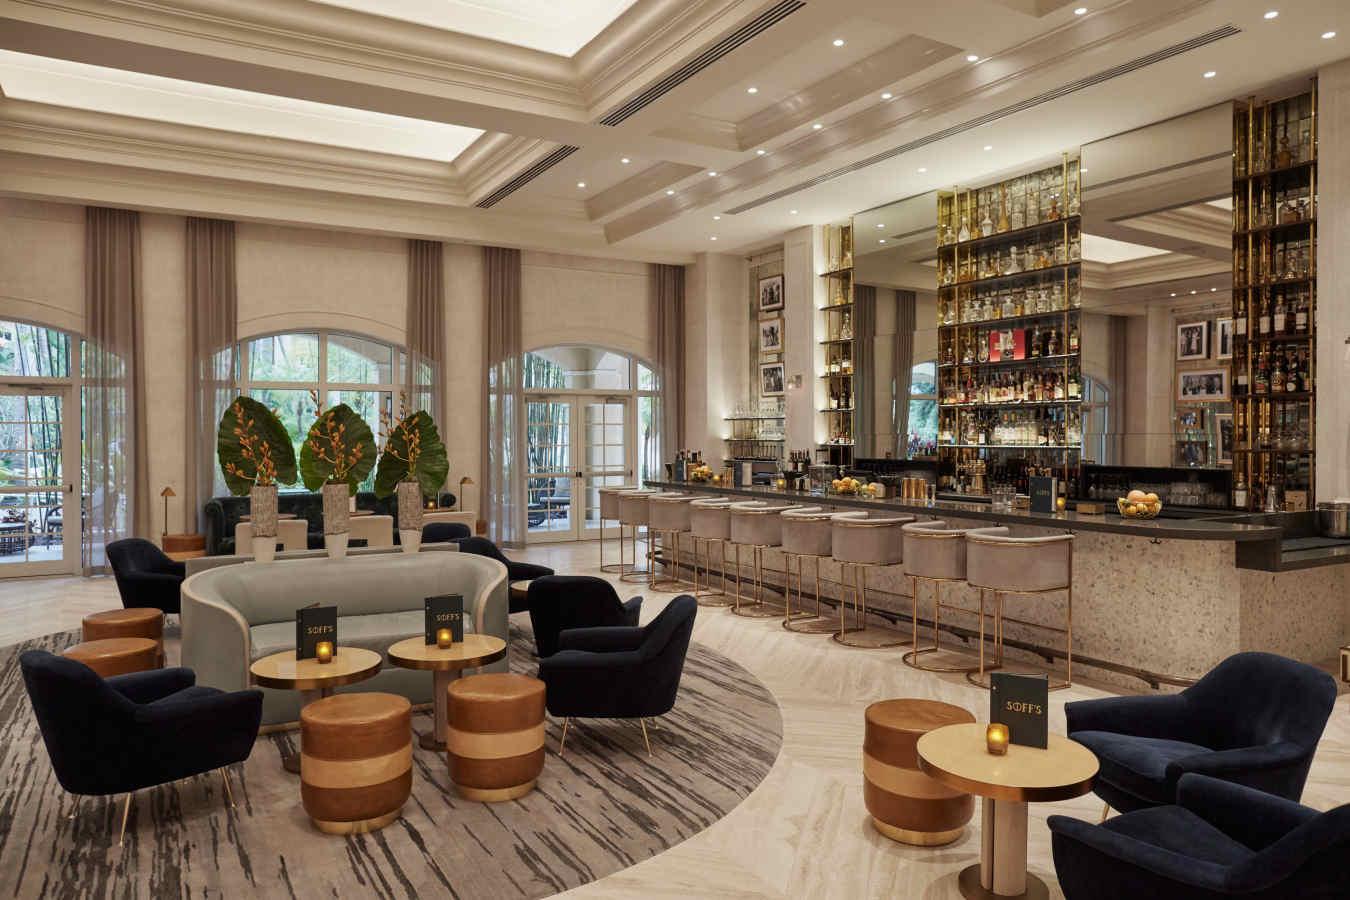 Soff's Lobby Lounge